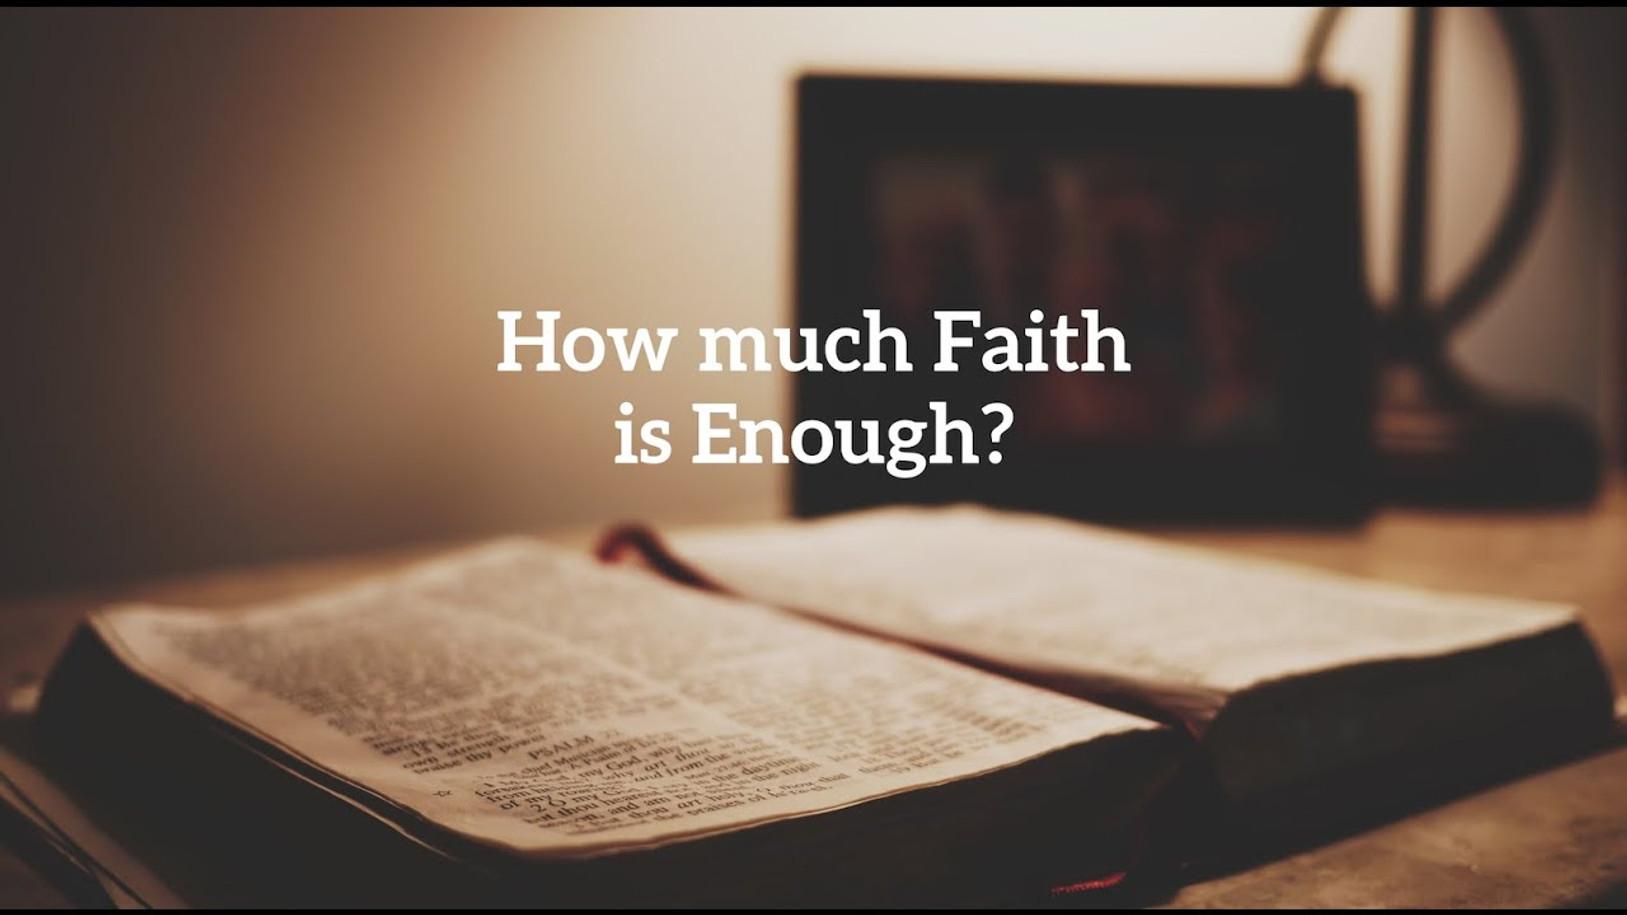 How much faith is enough?